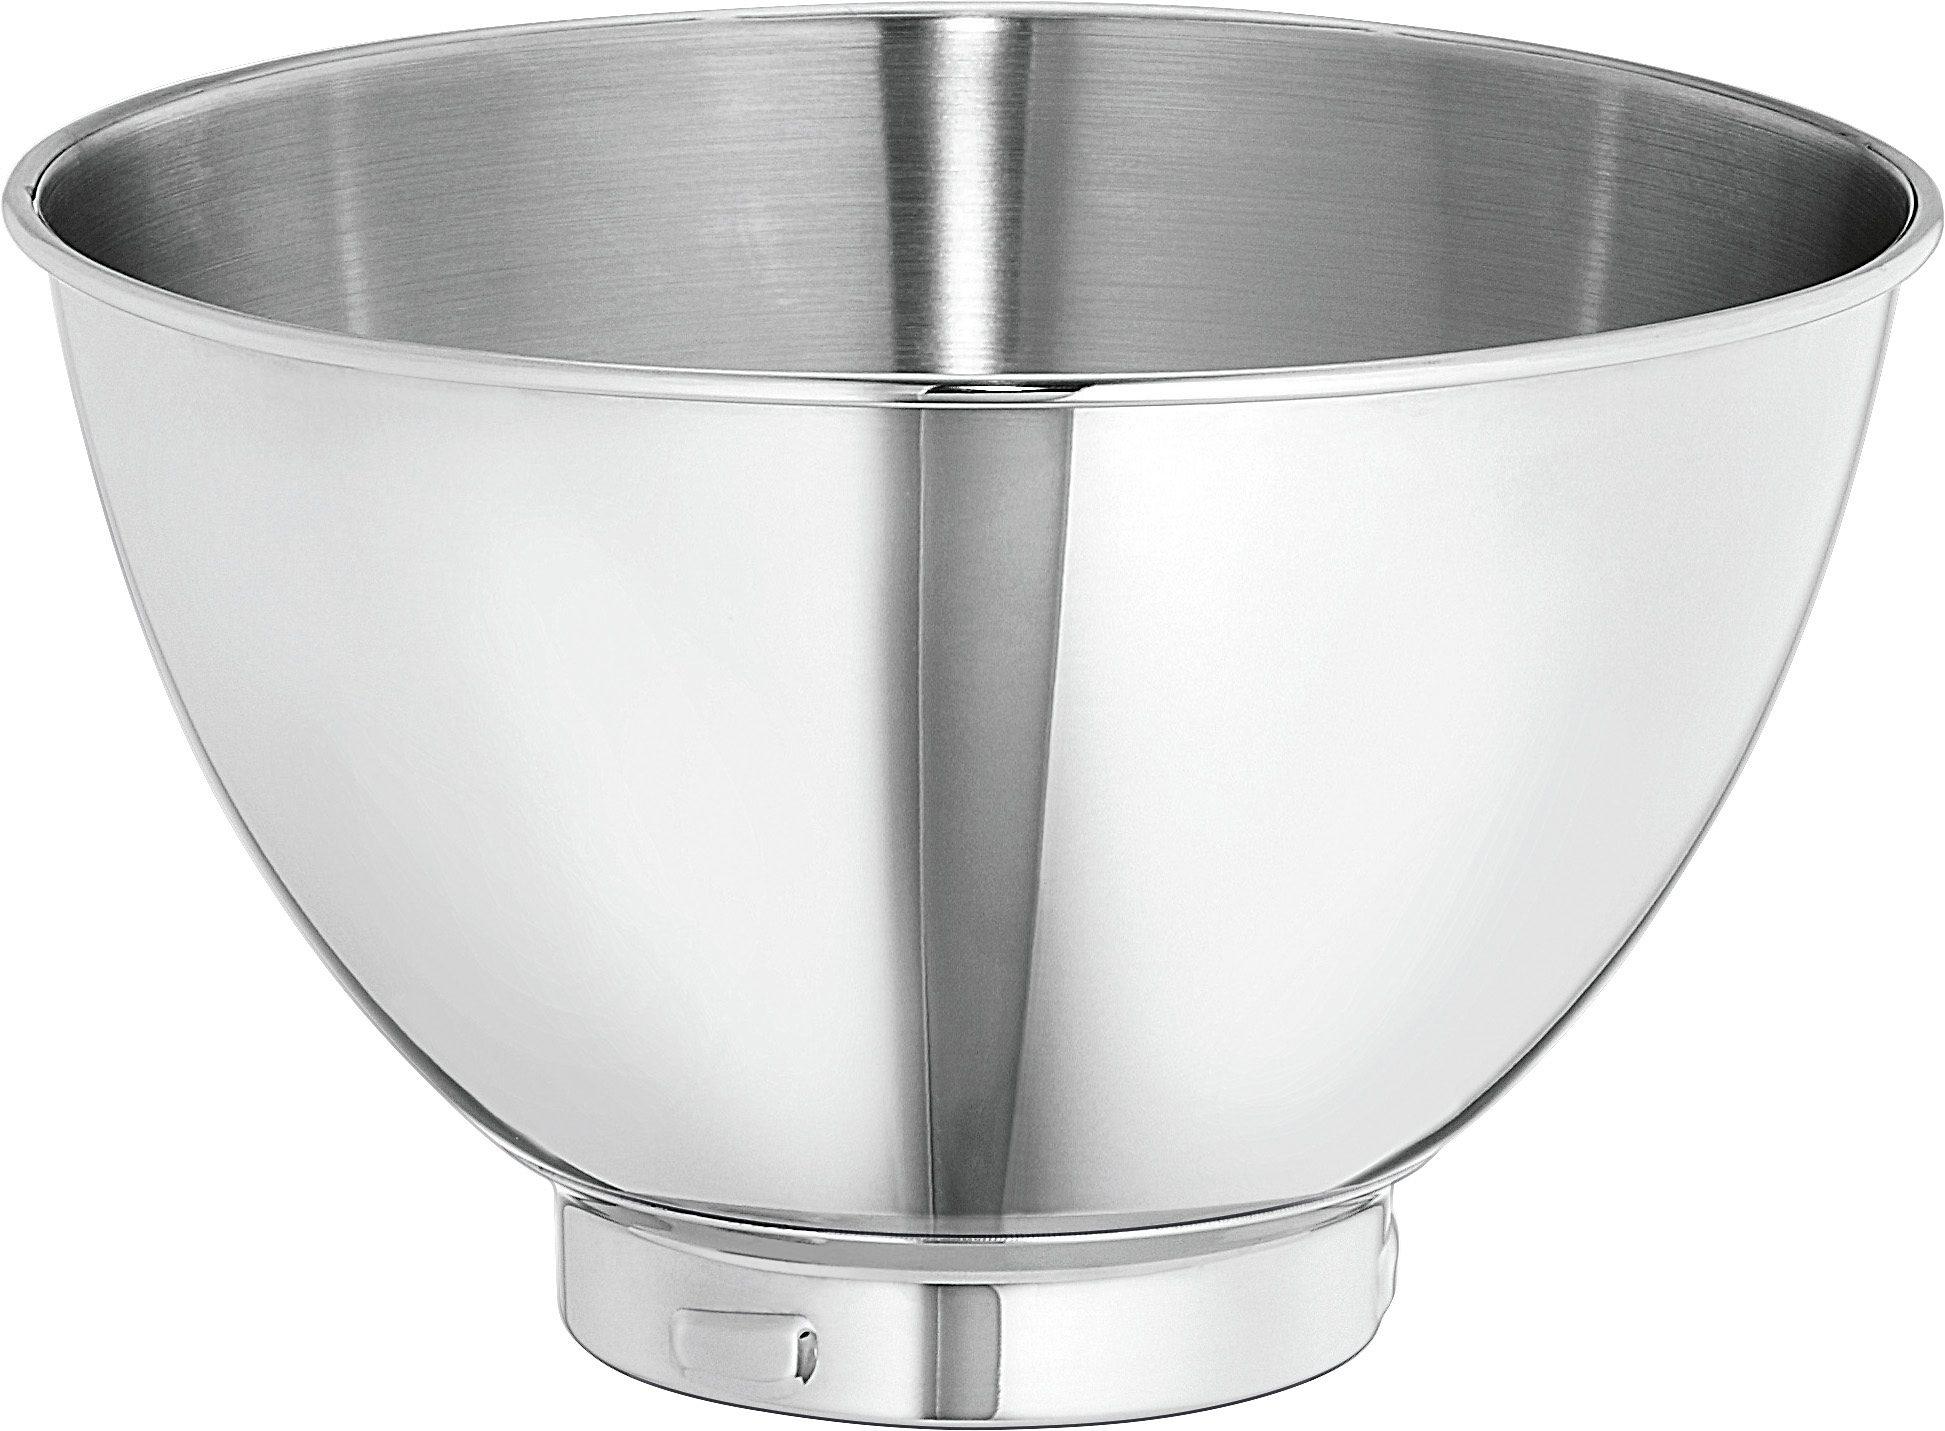 WMF Profi Plus Rührschüssel, 3,6 Liter